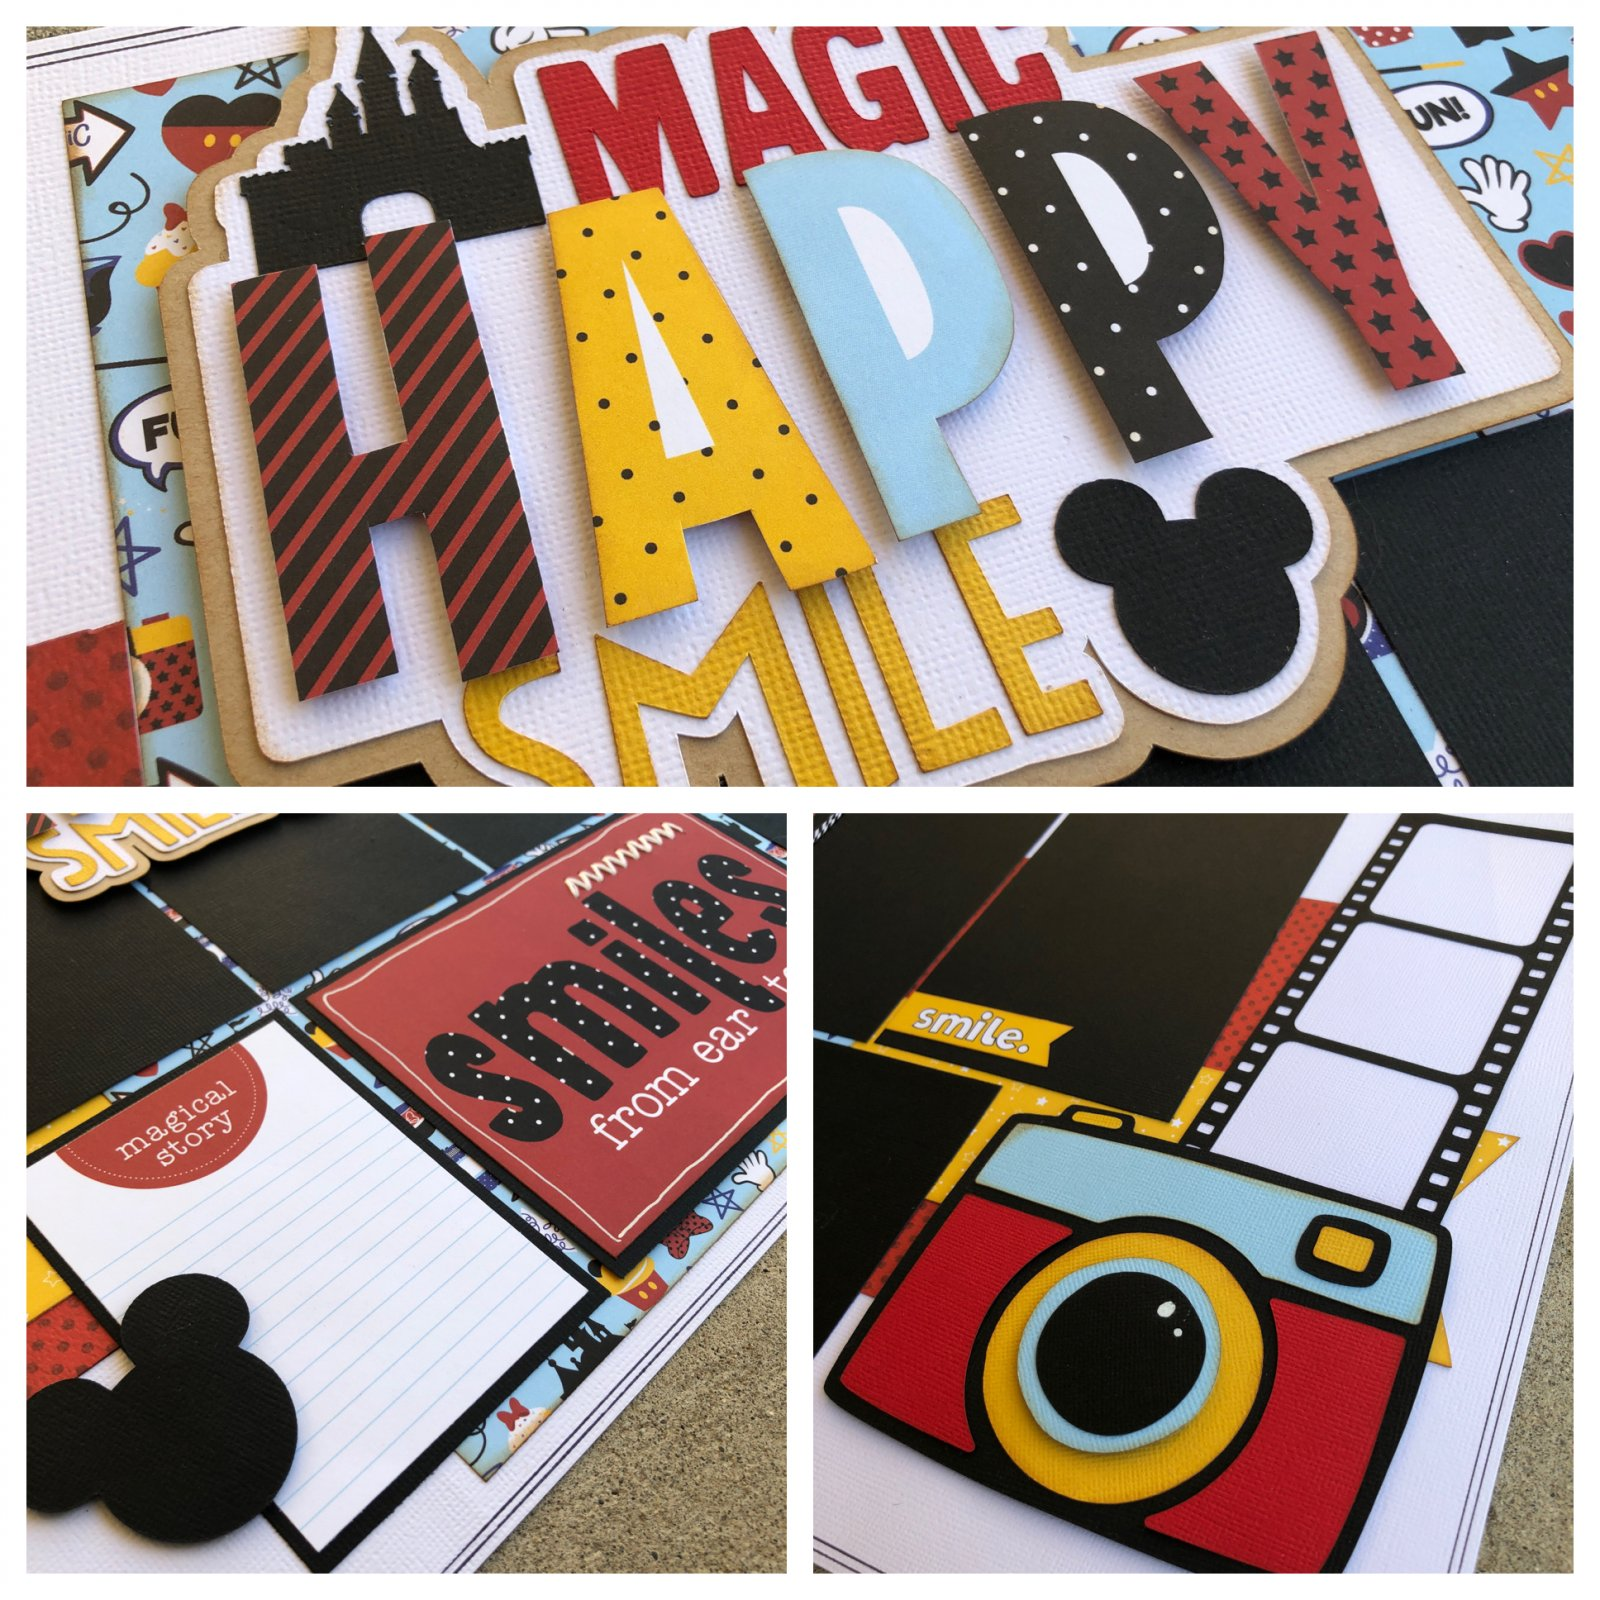 Magic Happy Smile Kit